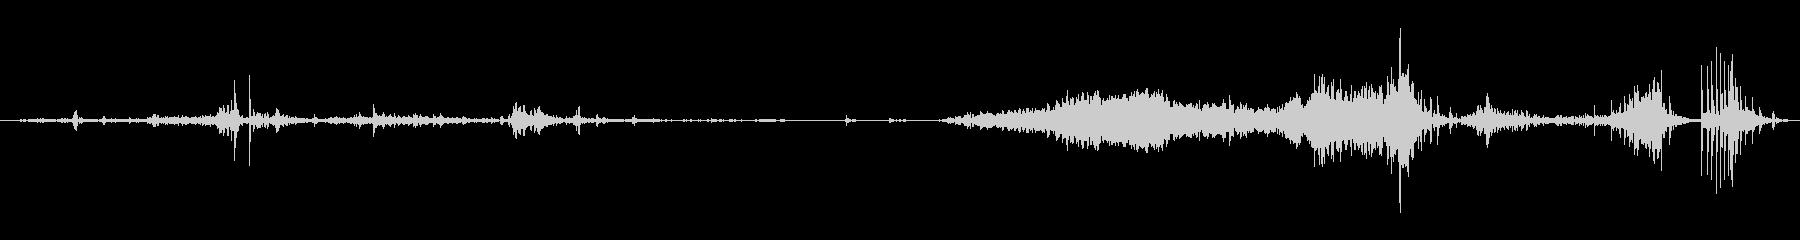 CANVAS SUITCASE:ふ...の未再生の波形